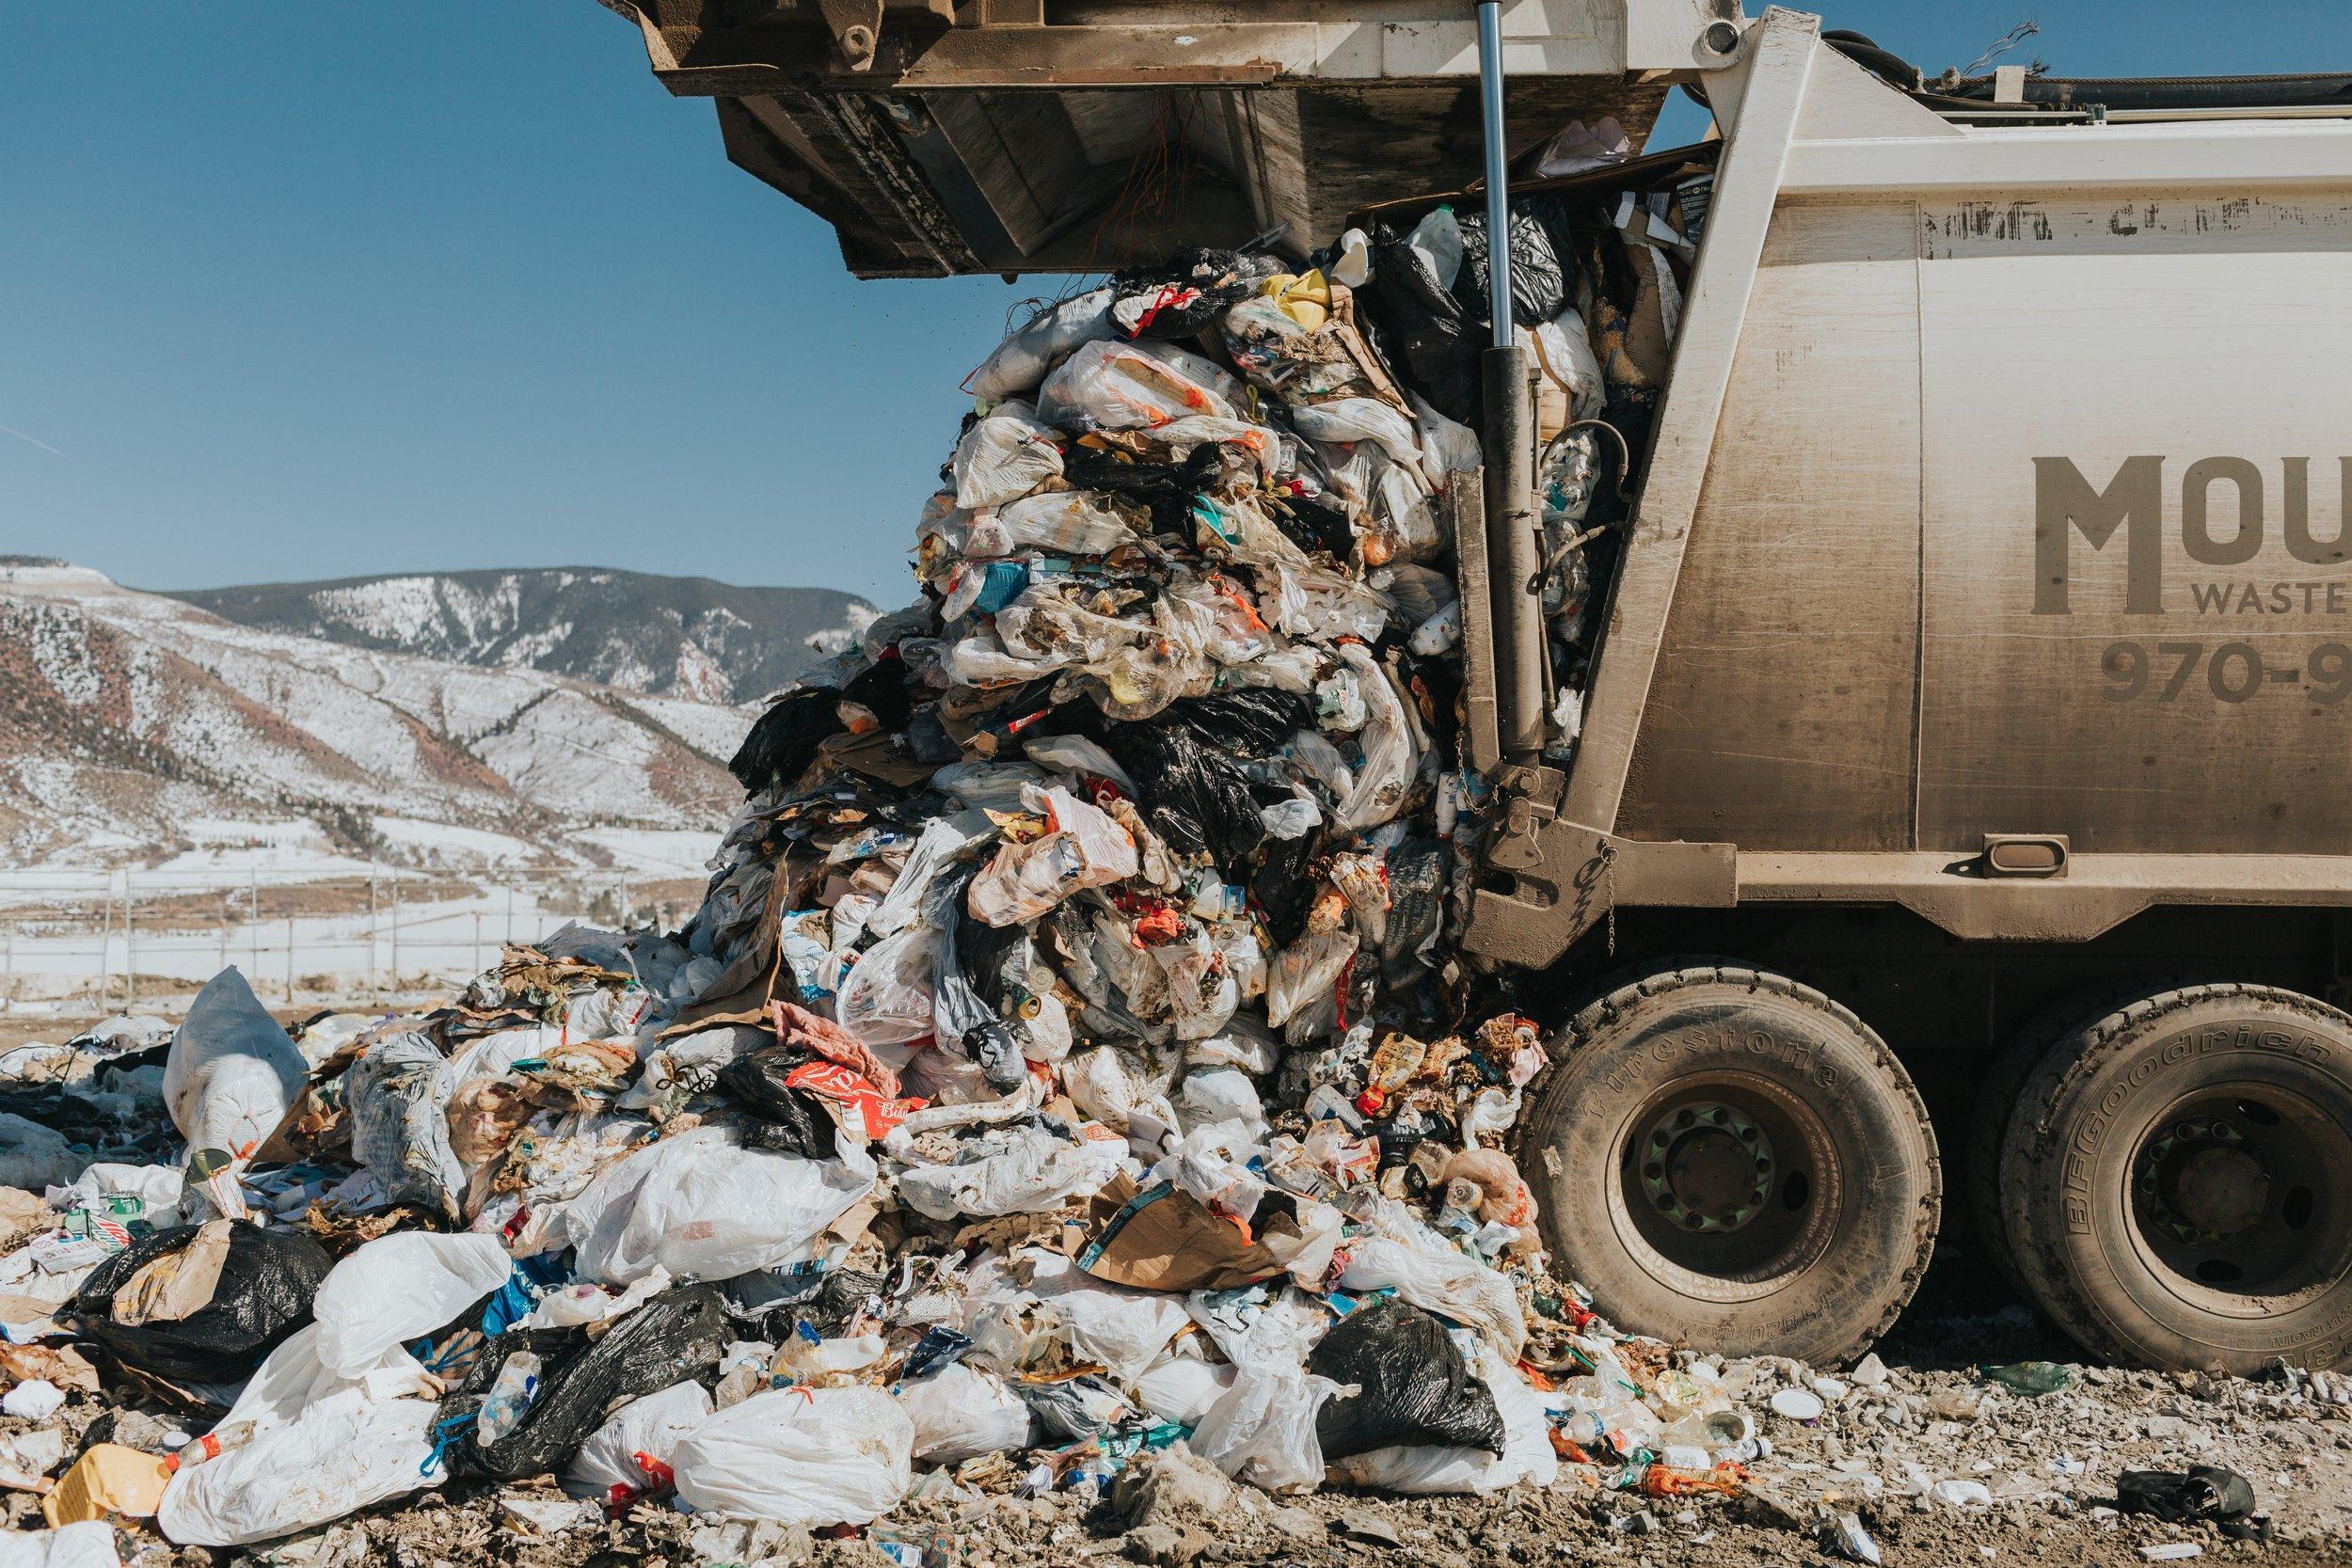 It's our single-hauler trash-iversary thumbnail